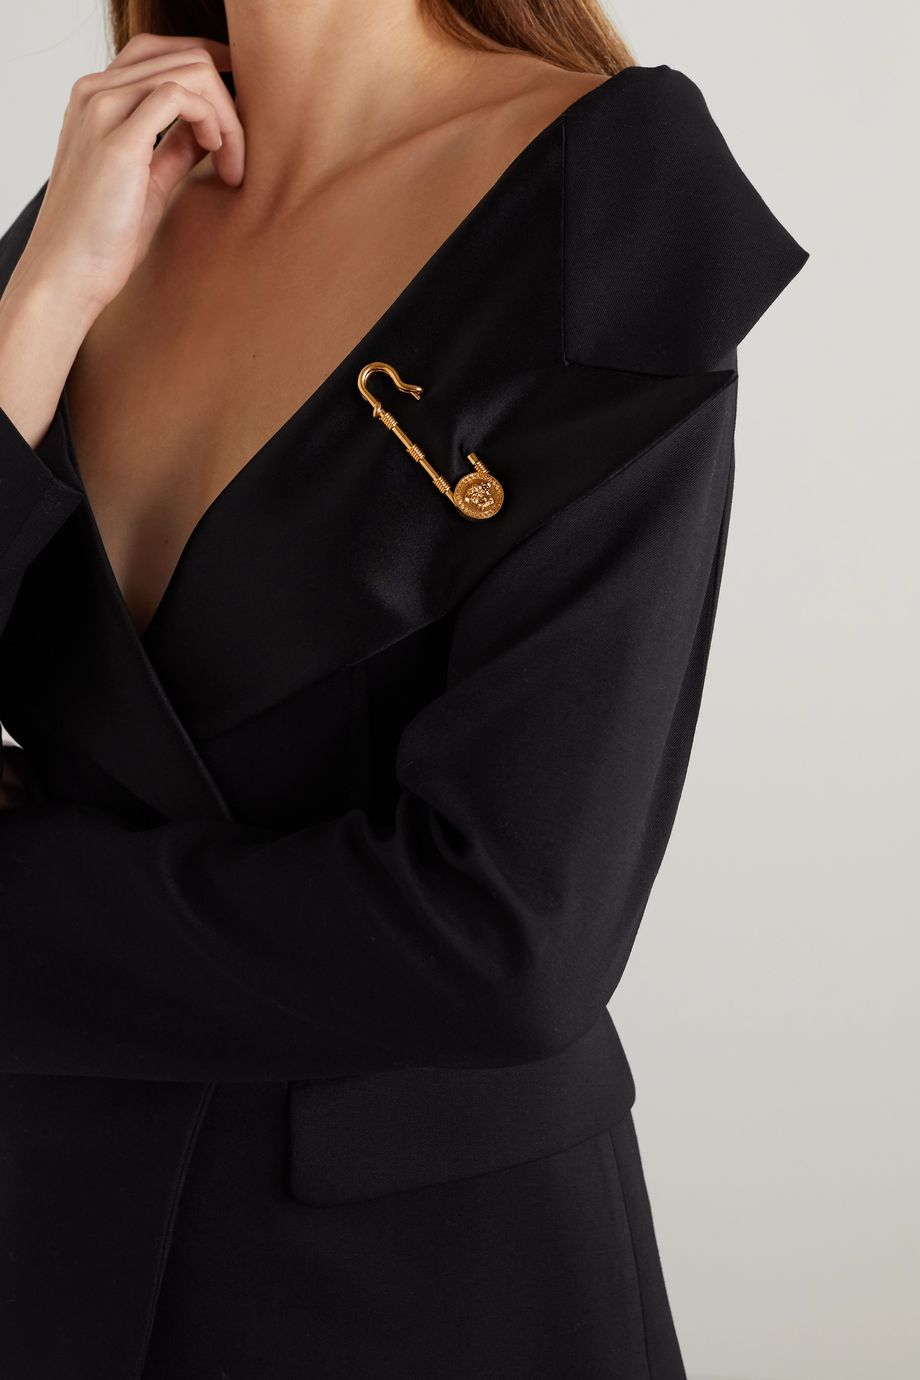 Versace 金色胸针